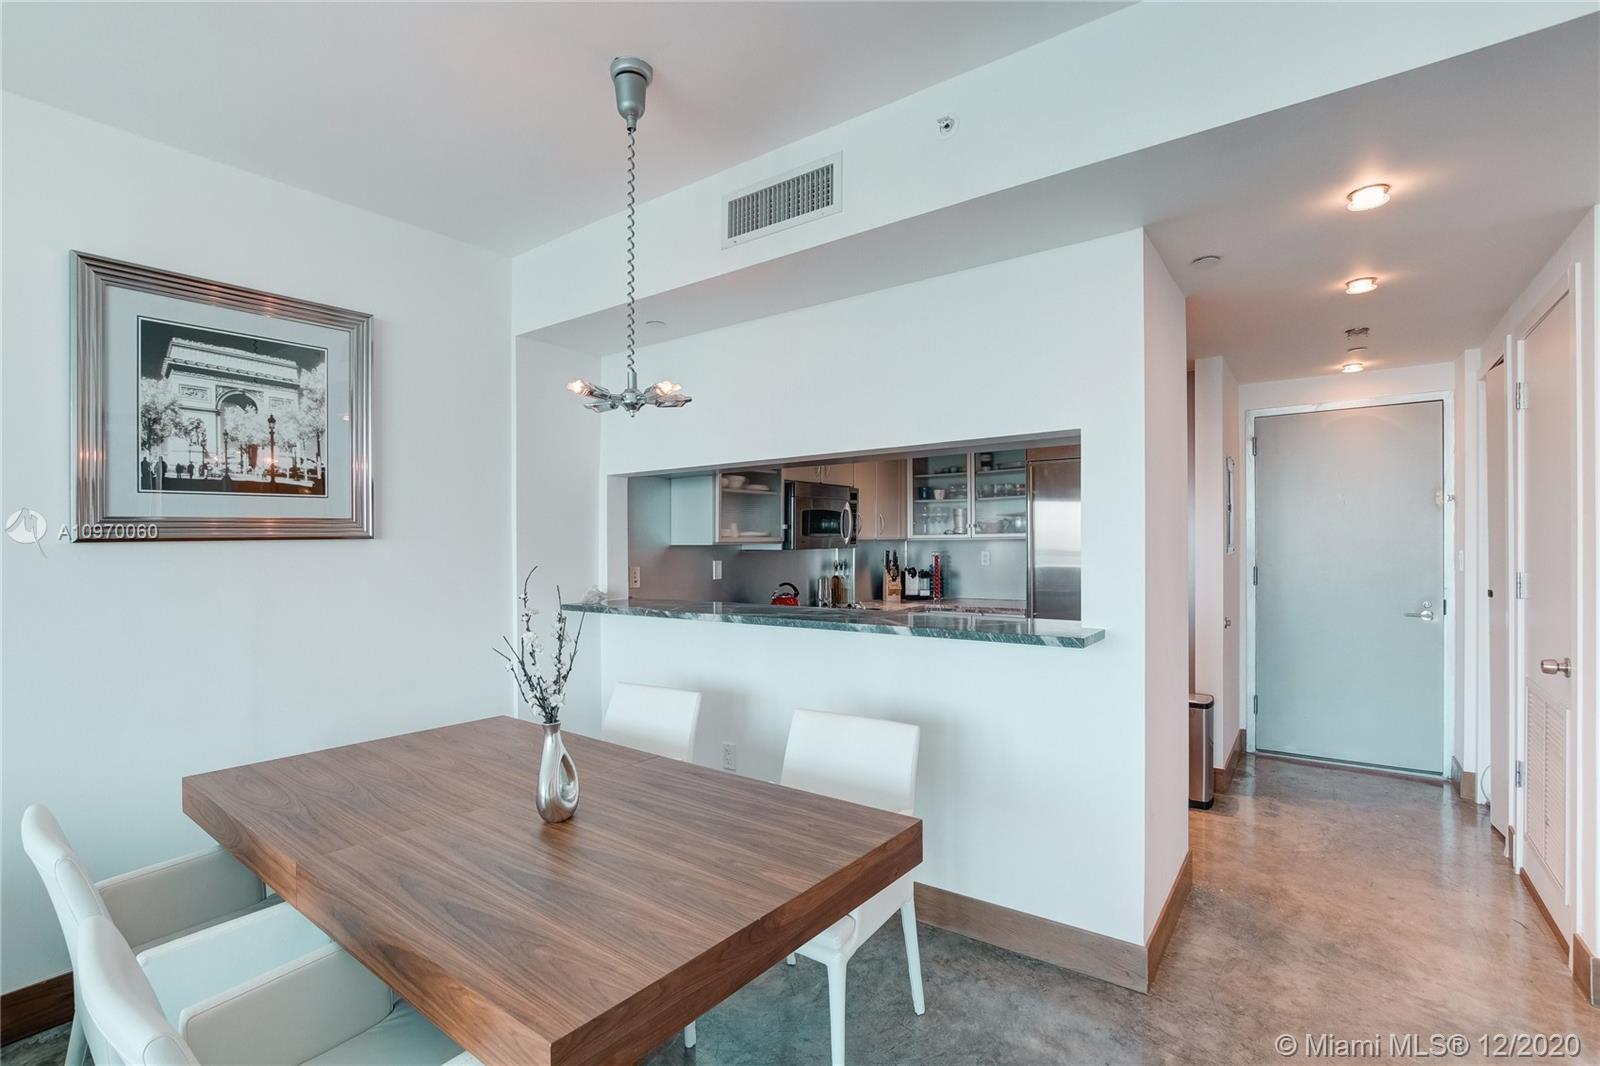 540 West Ave Unit: 2112 preview